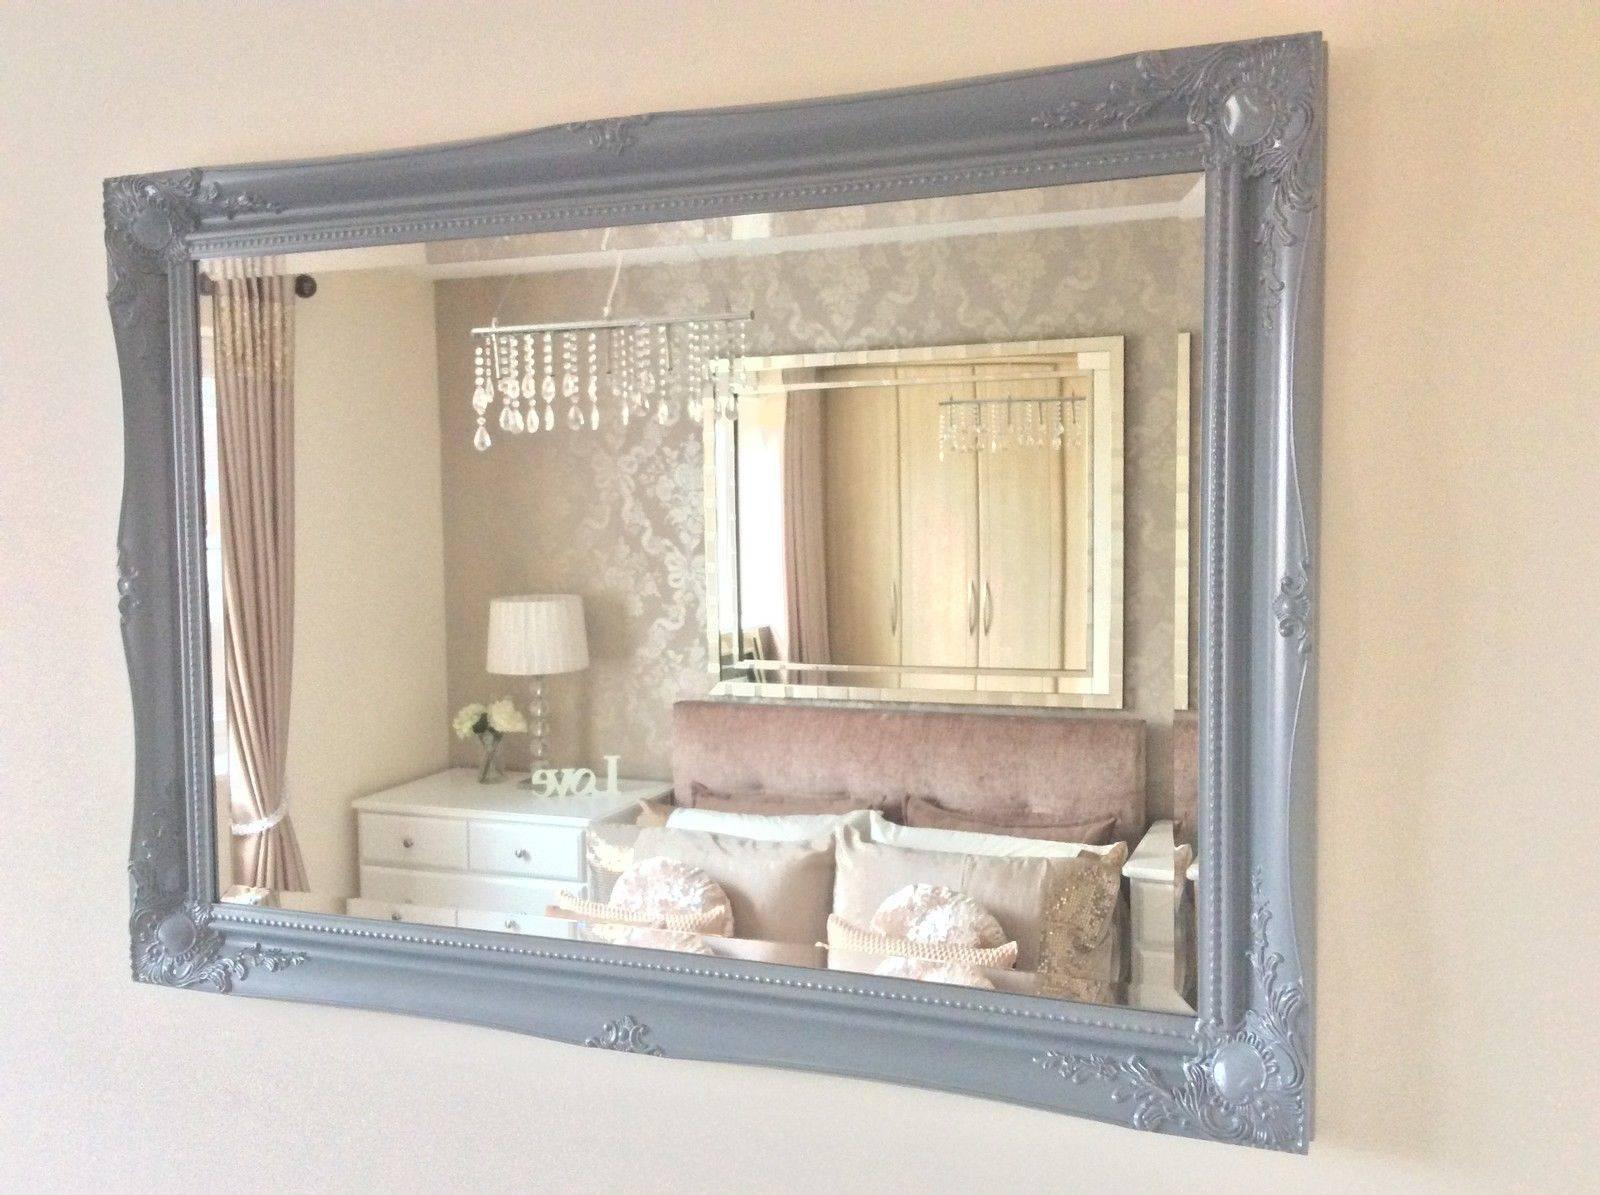 Grey Shabby Chic Ornate Decorative Wall Mirror Free Postage In Shabby Chic Wall Mirrors (View 3 of 15)